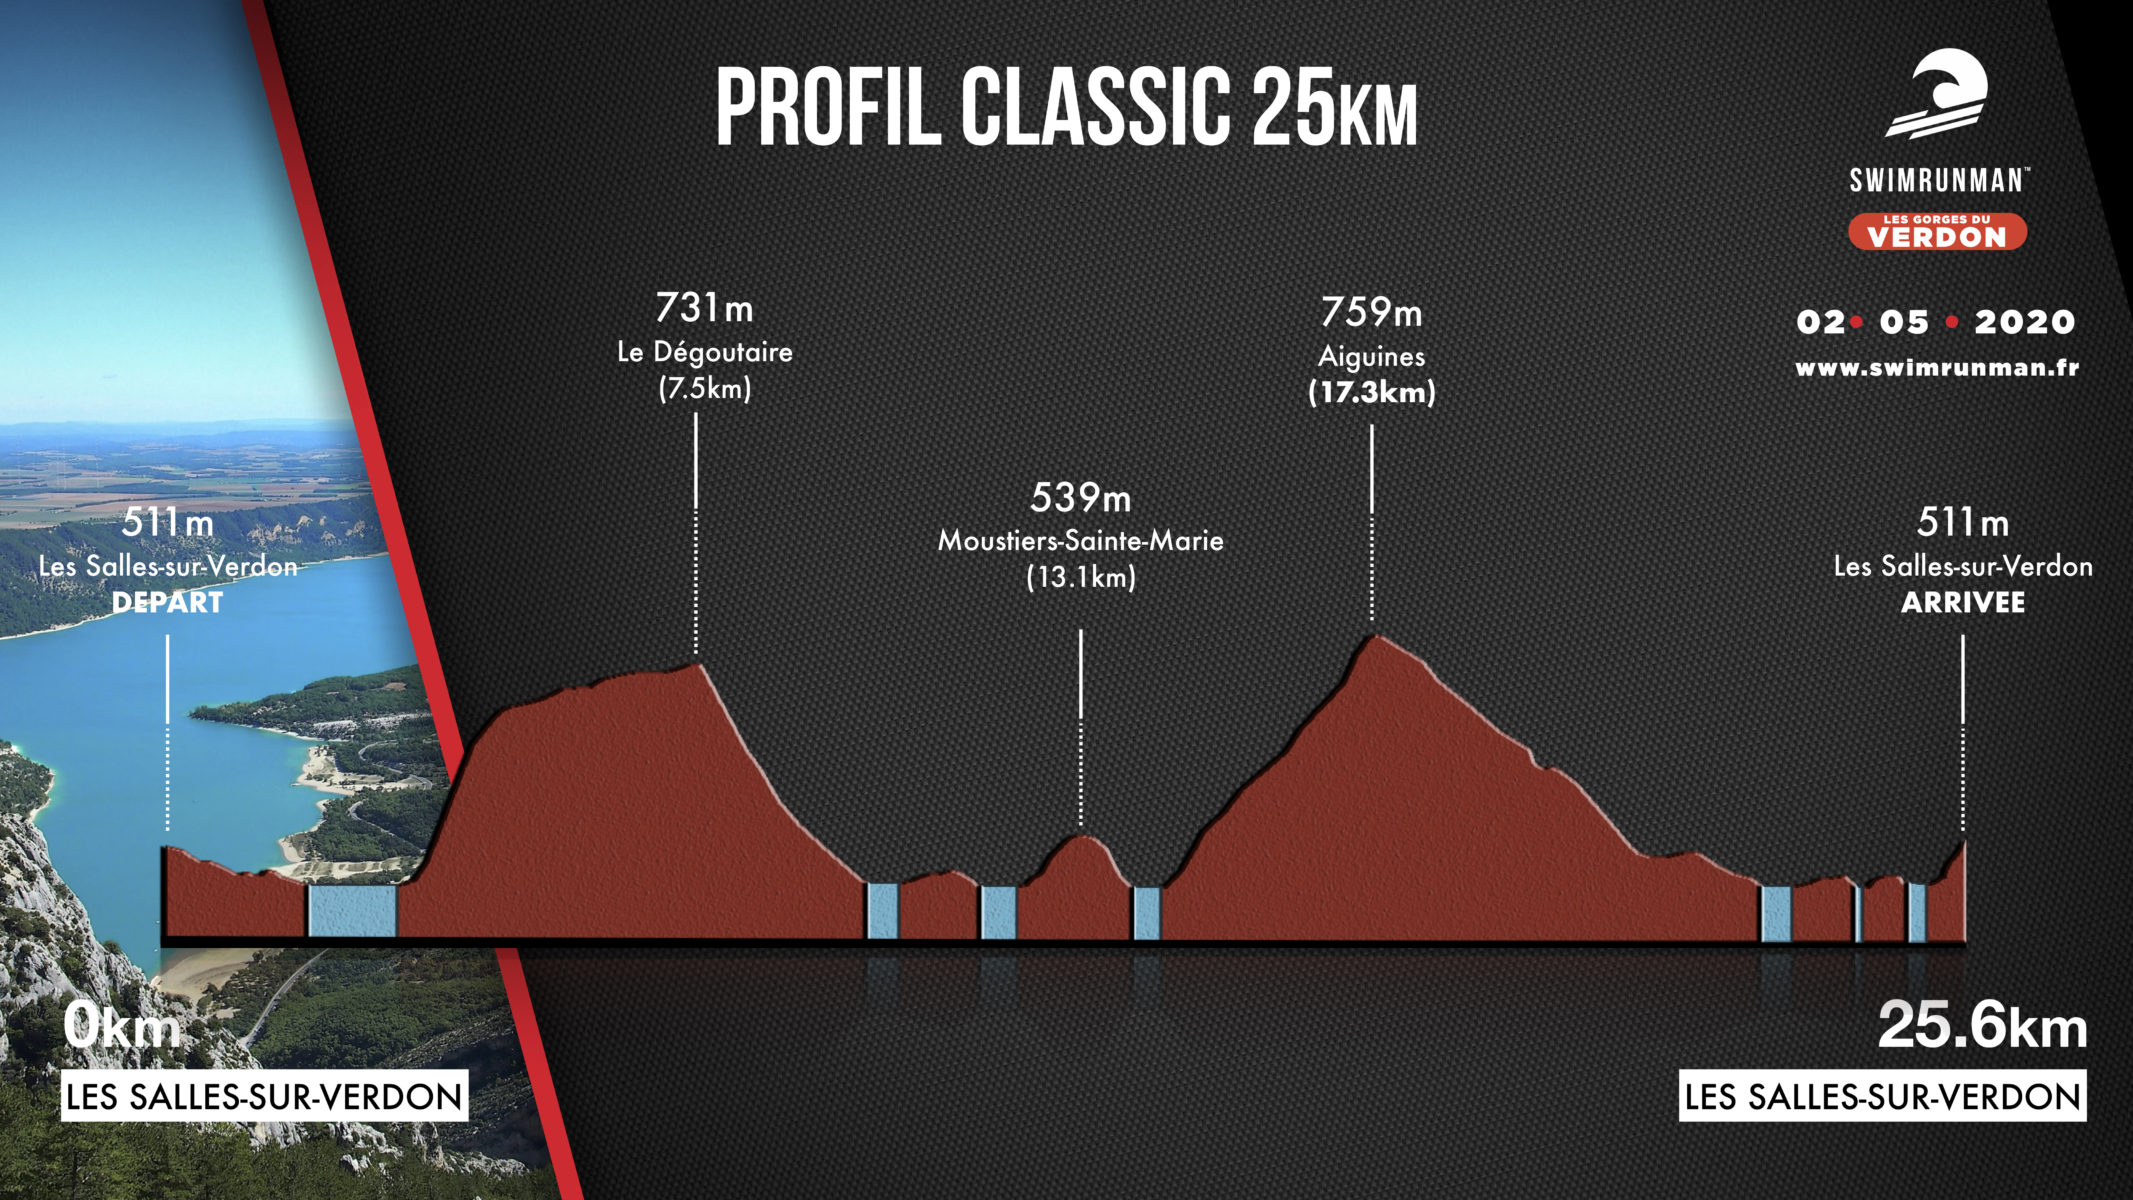 Profil parcours swimrunman classic verdon